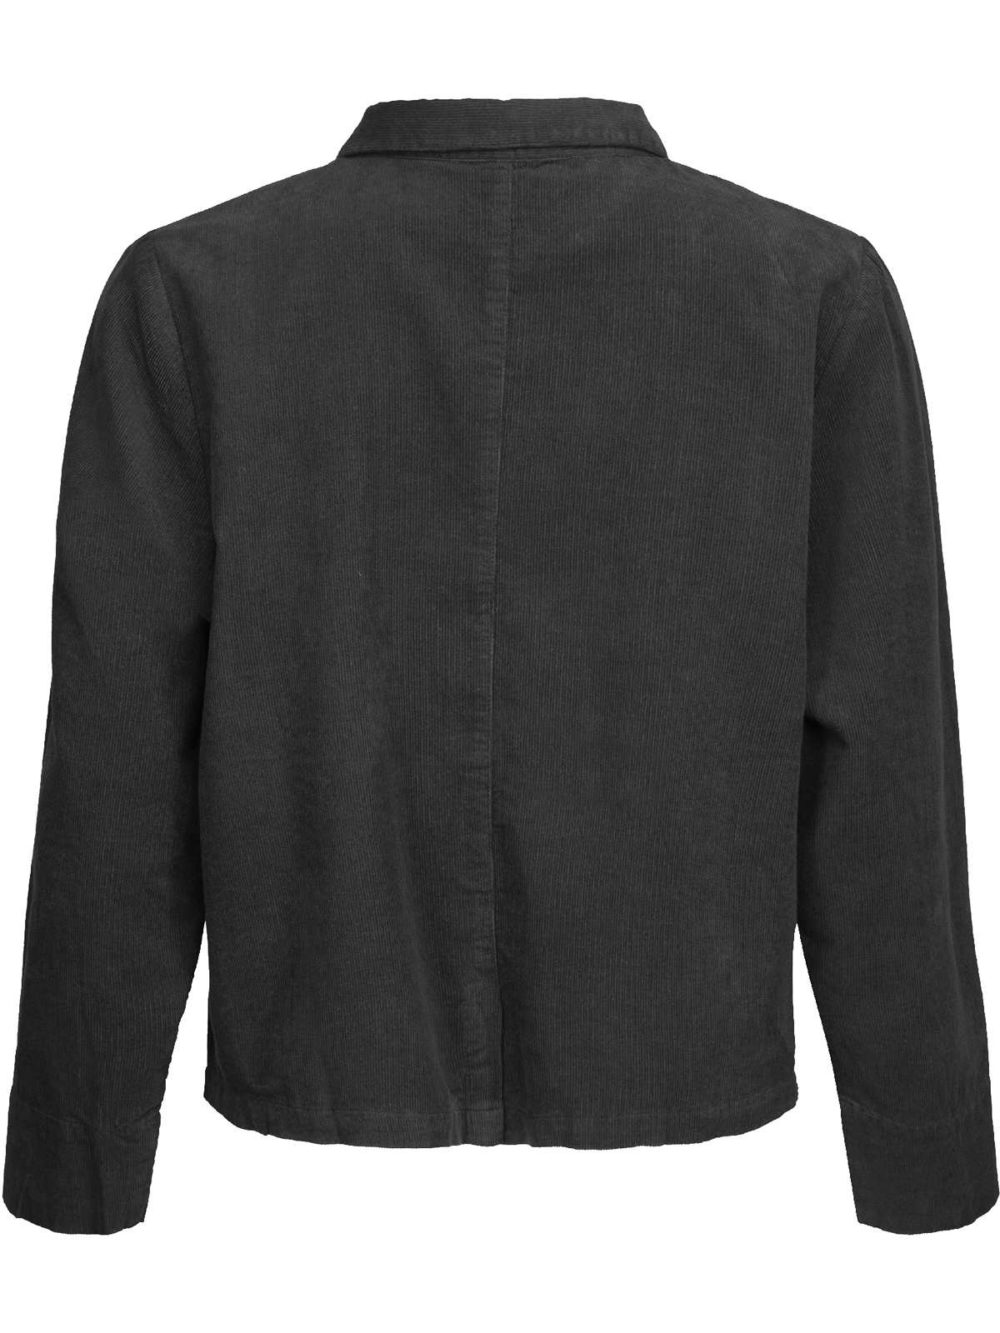 Clari Jacket